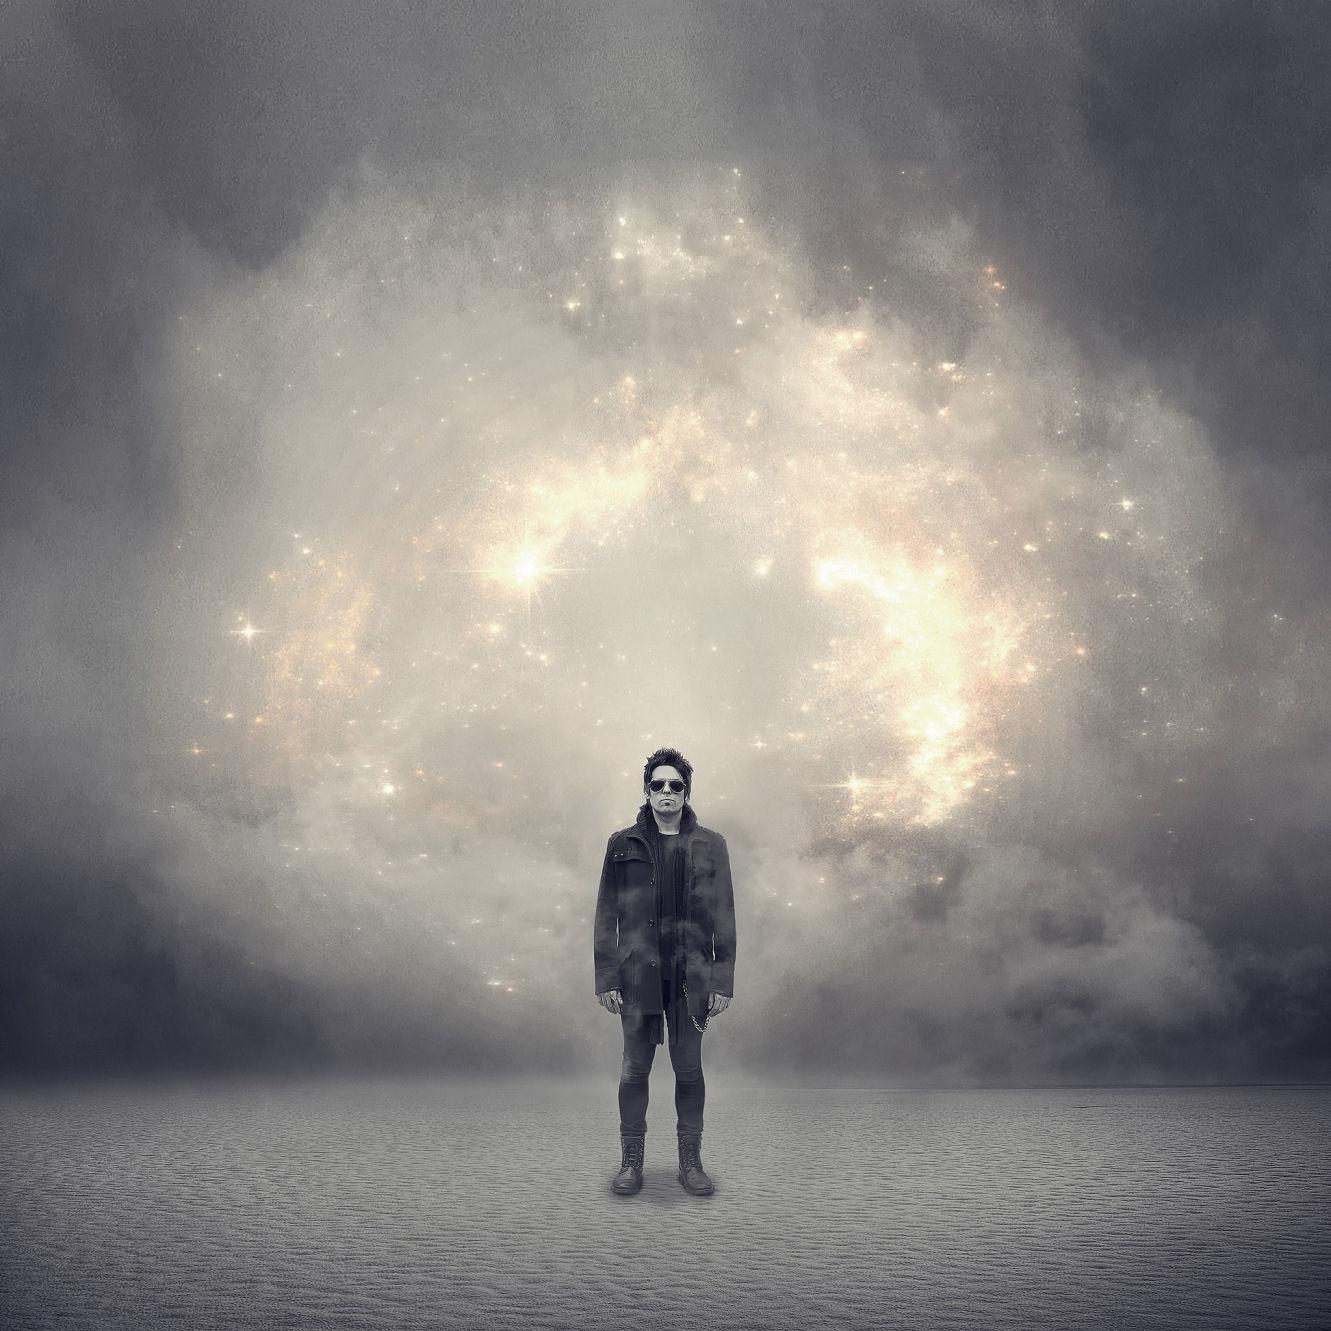 Astral Darkness – Surreal Dreams